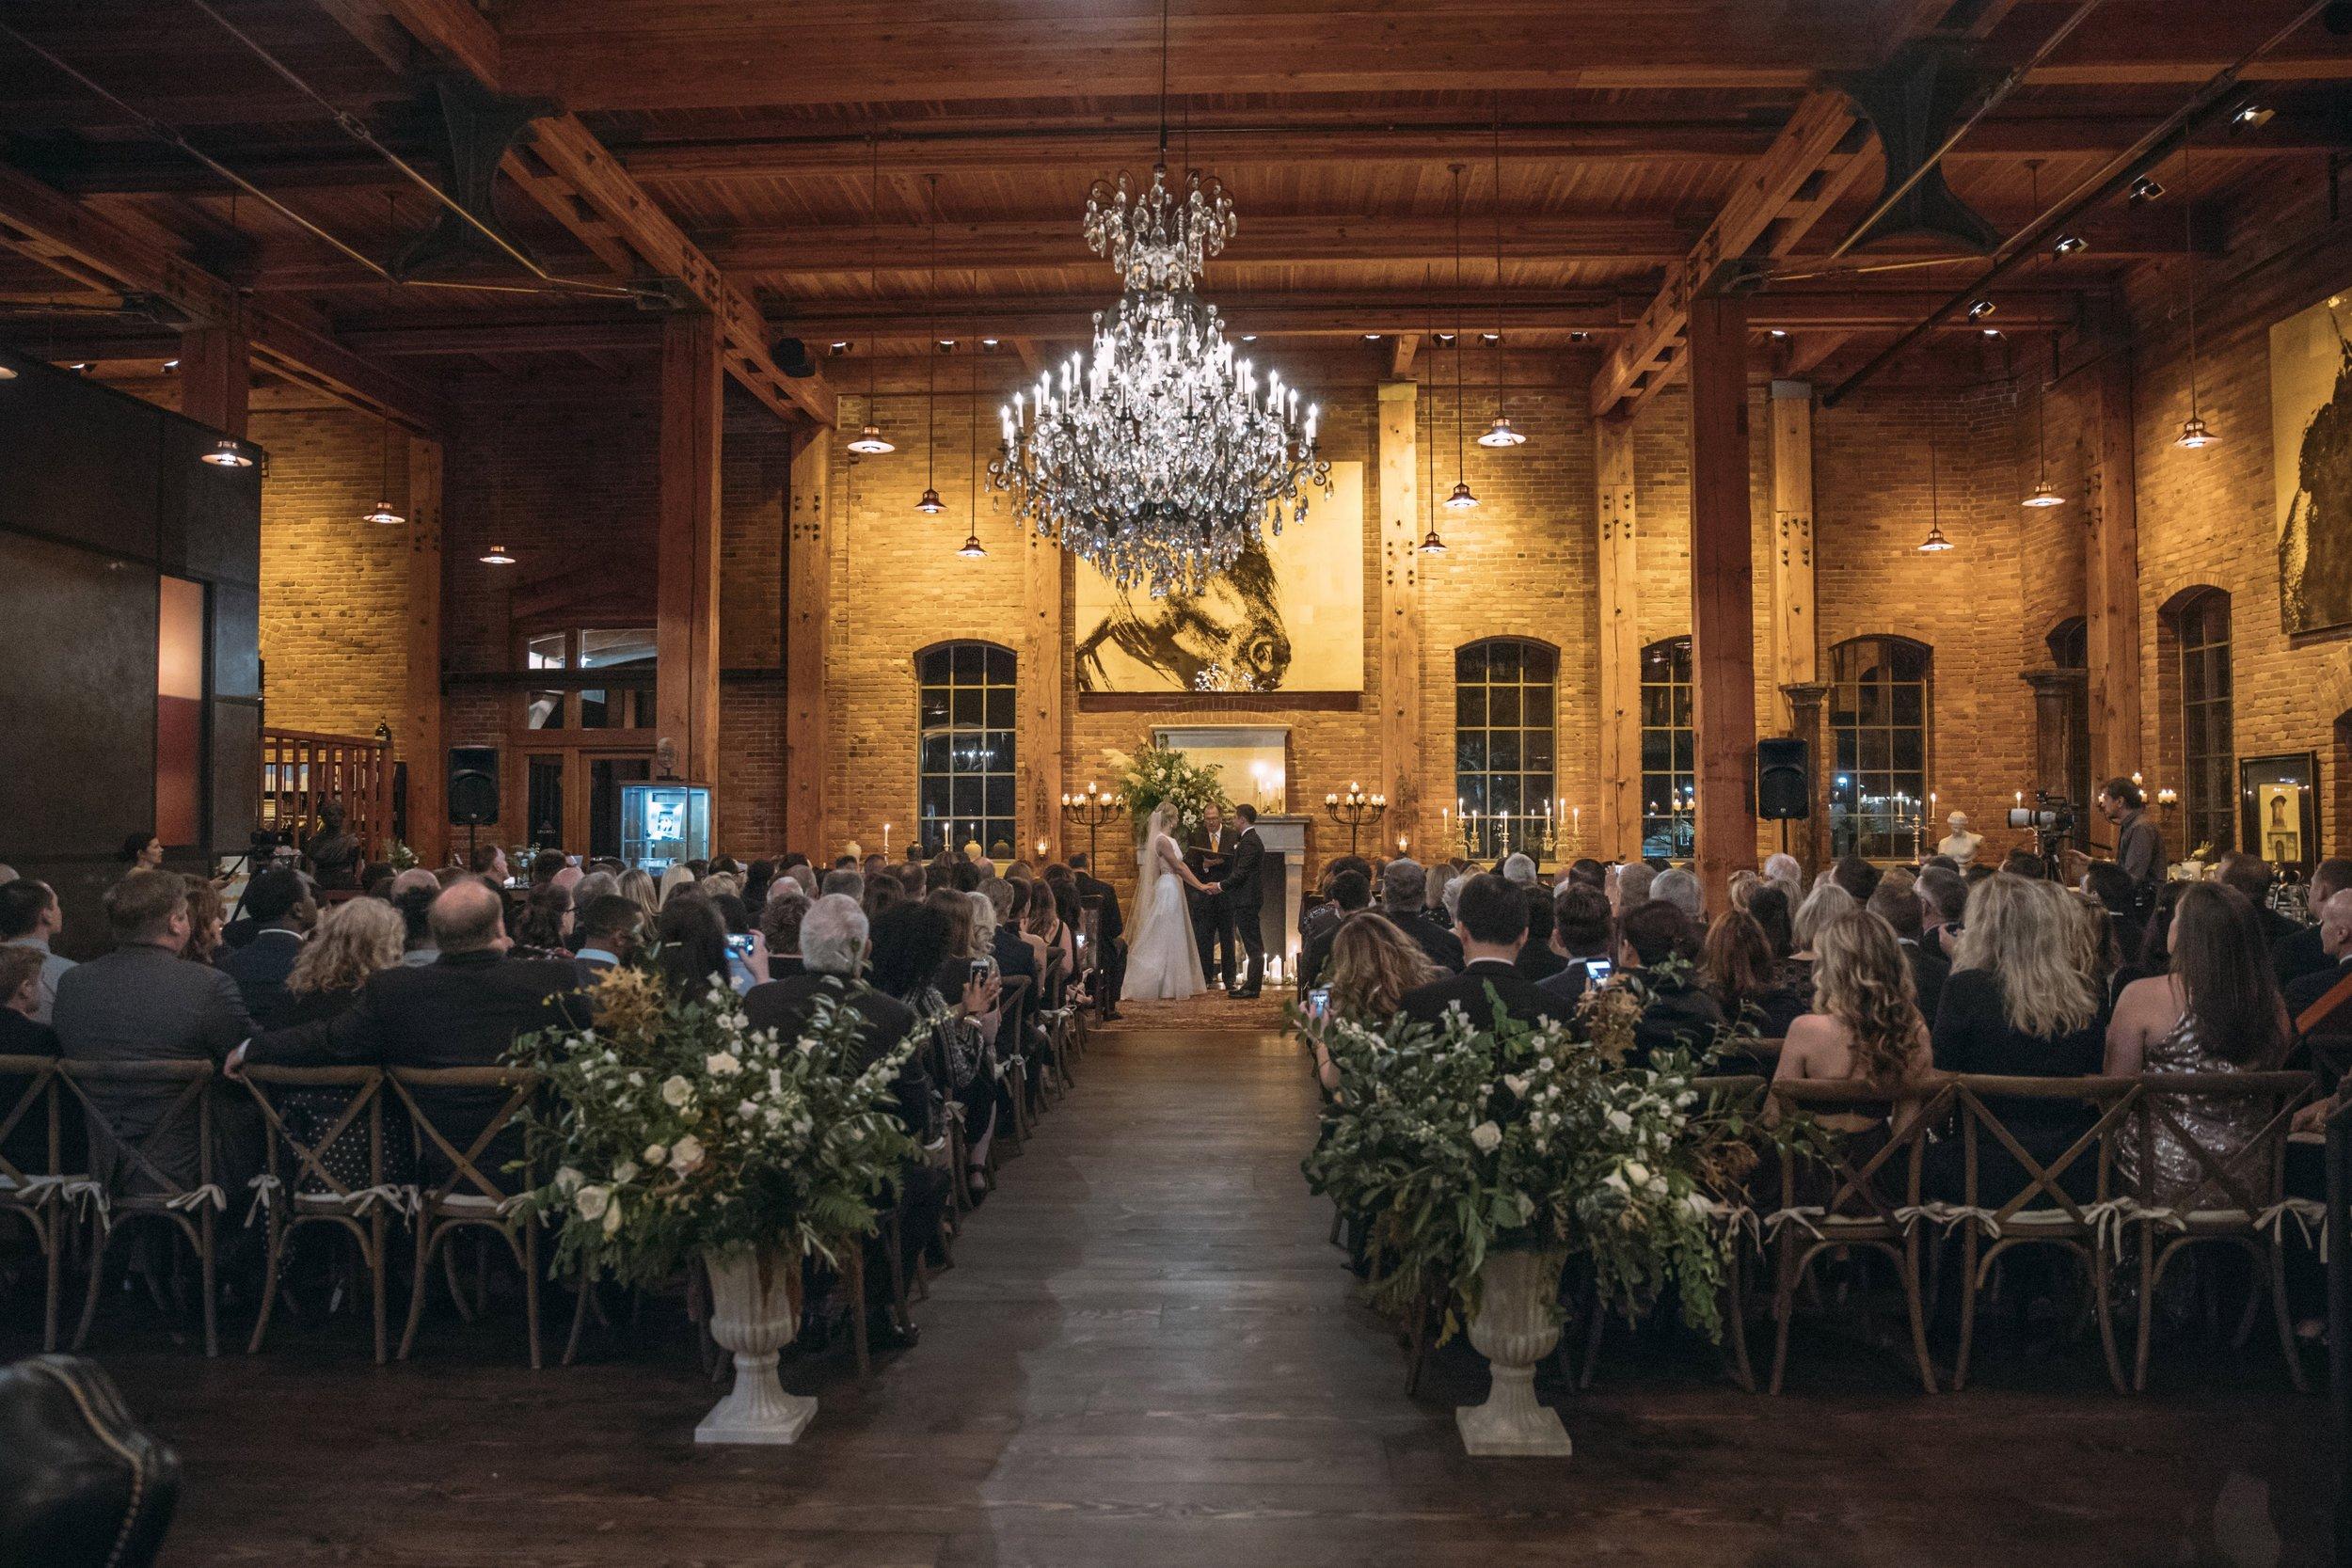 Portland_wedding_planner_walla_walla_05.jpg